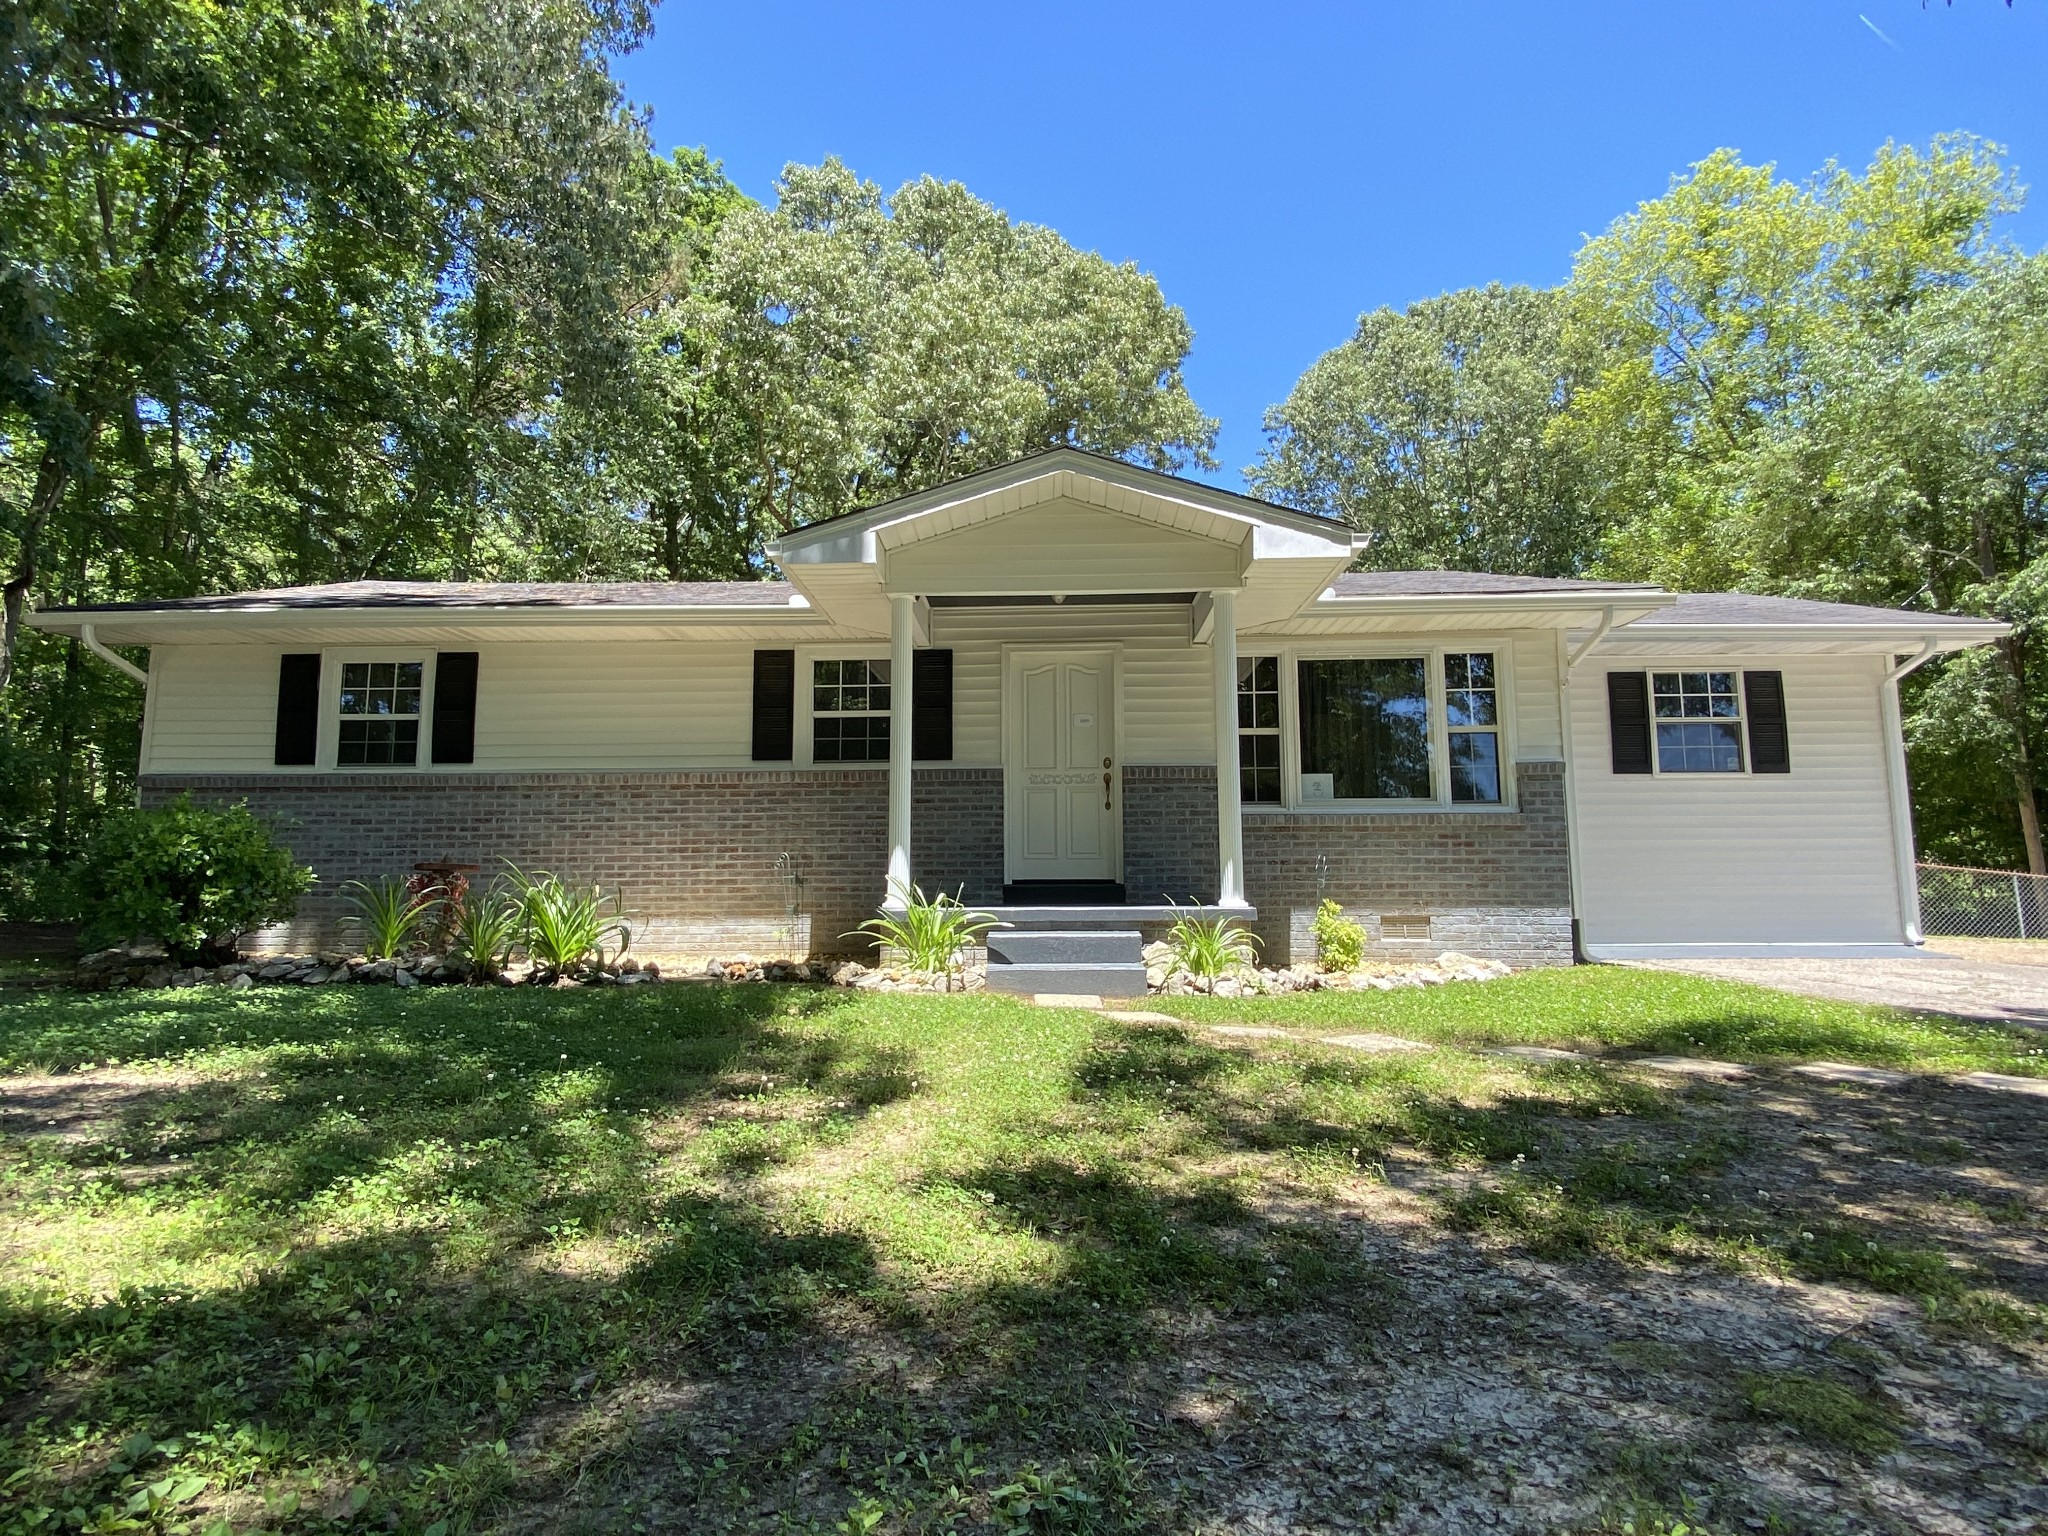 816 Post Oak Rd Property Photo - Camden, TN real estate listing